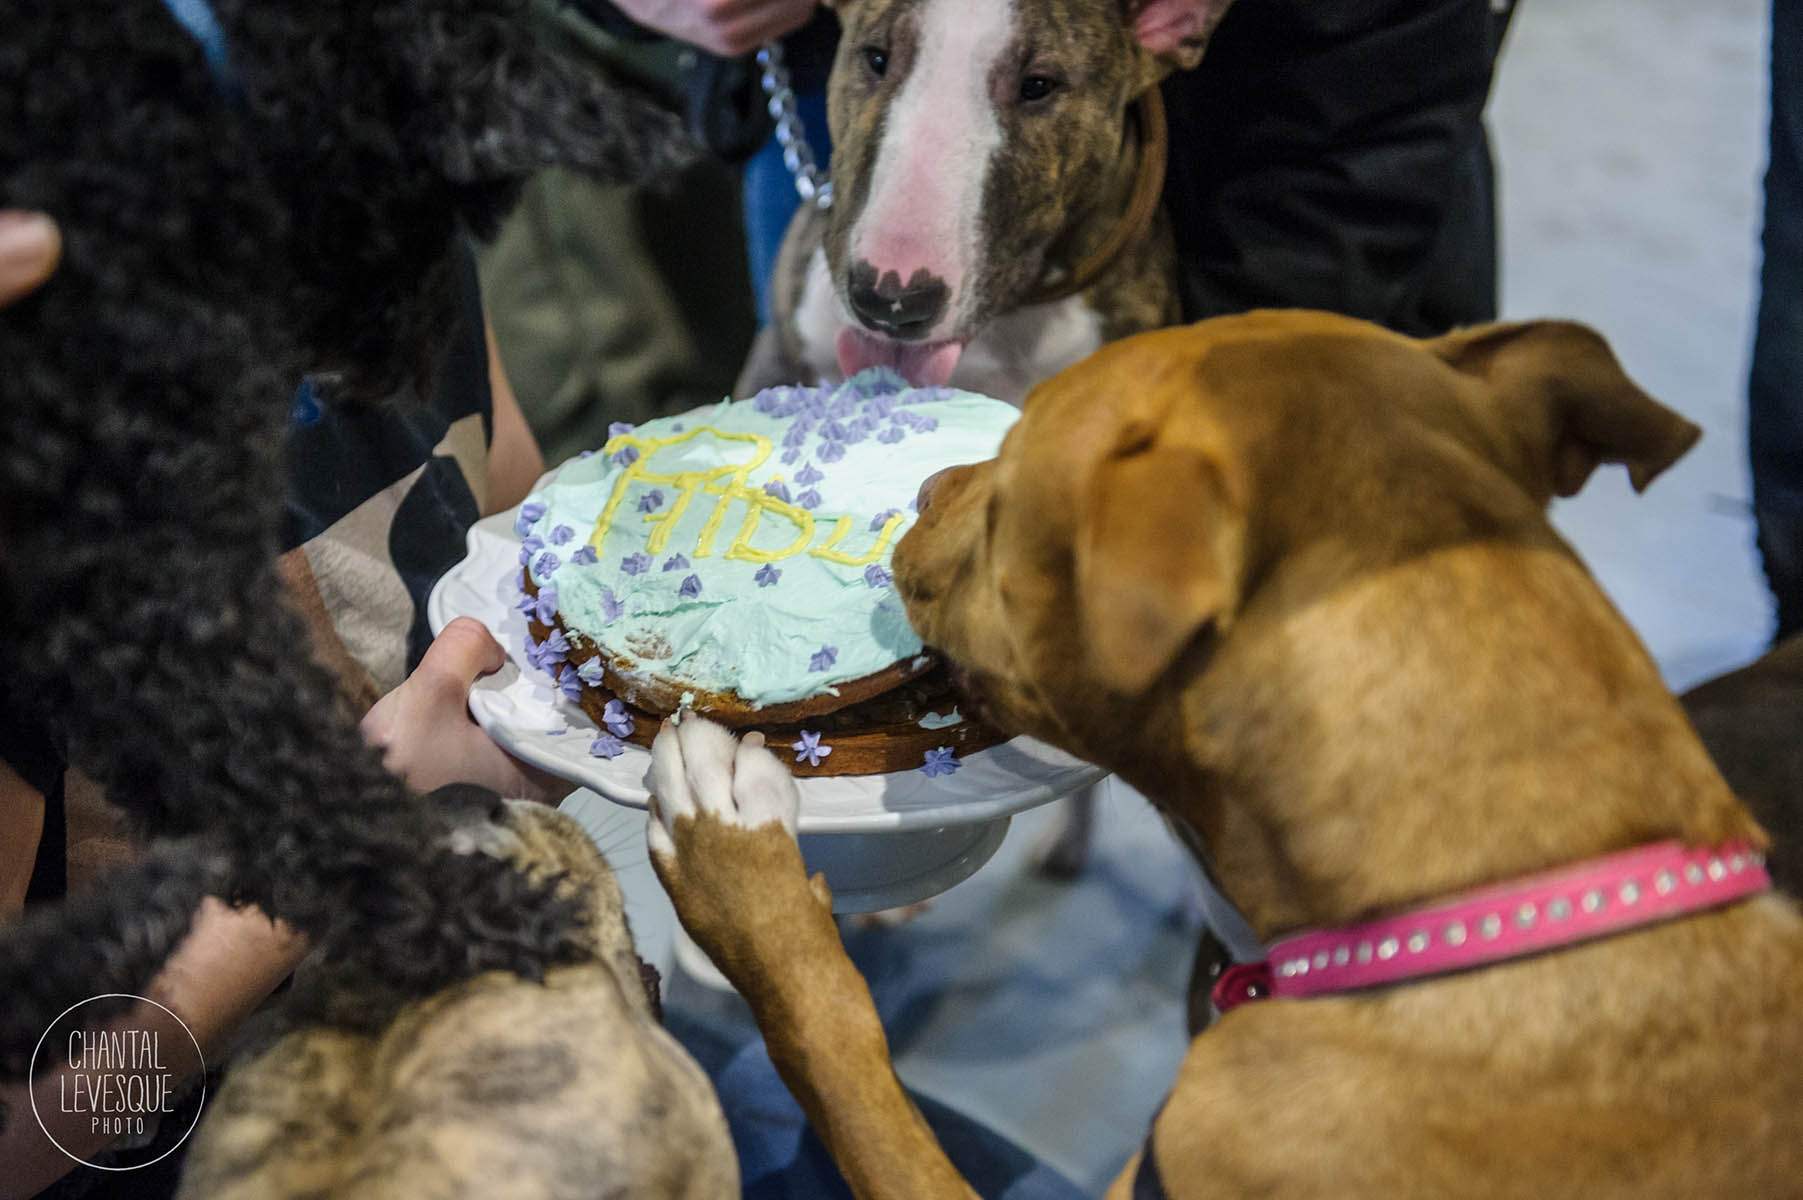 Doggy-casting-pitbulls-4747.jpg